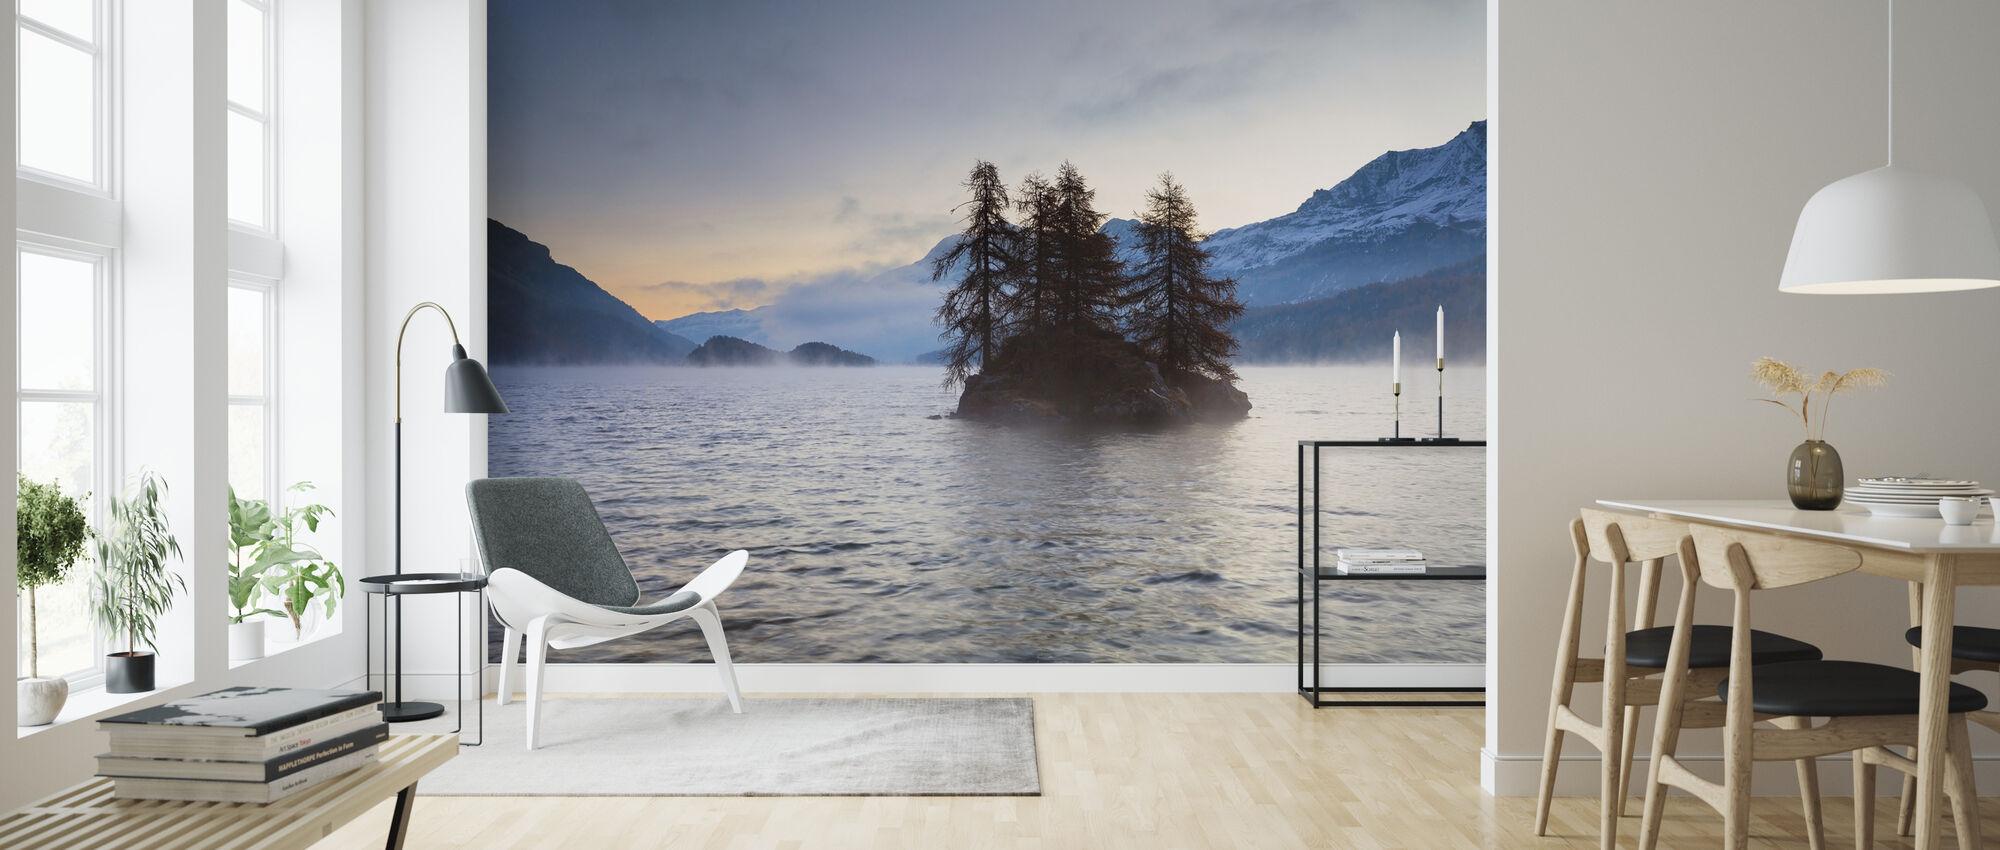 Island in Lake Sils - Wallpaper - Living Room